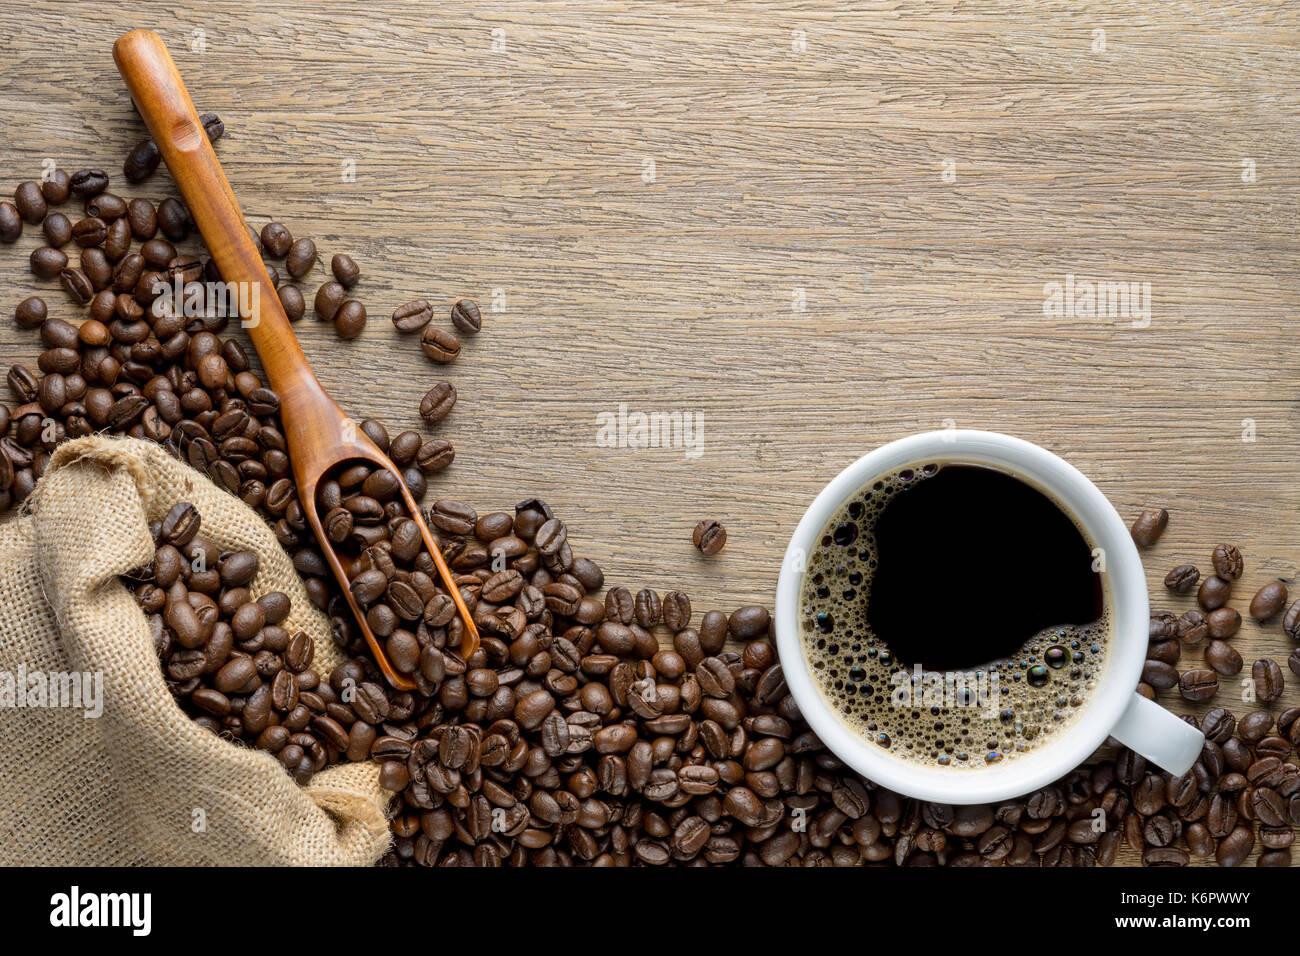 sack hemp coffee stockfotos sack hemp coffee bilder alamy. Black Bedroom Furniture Sets. Home Design Ideas